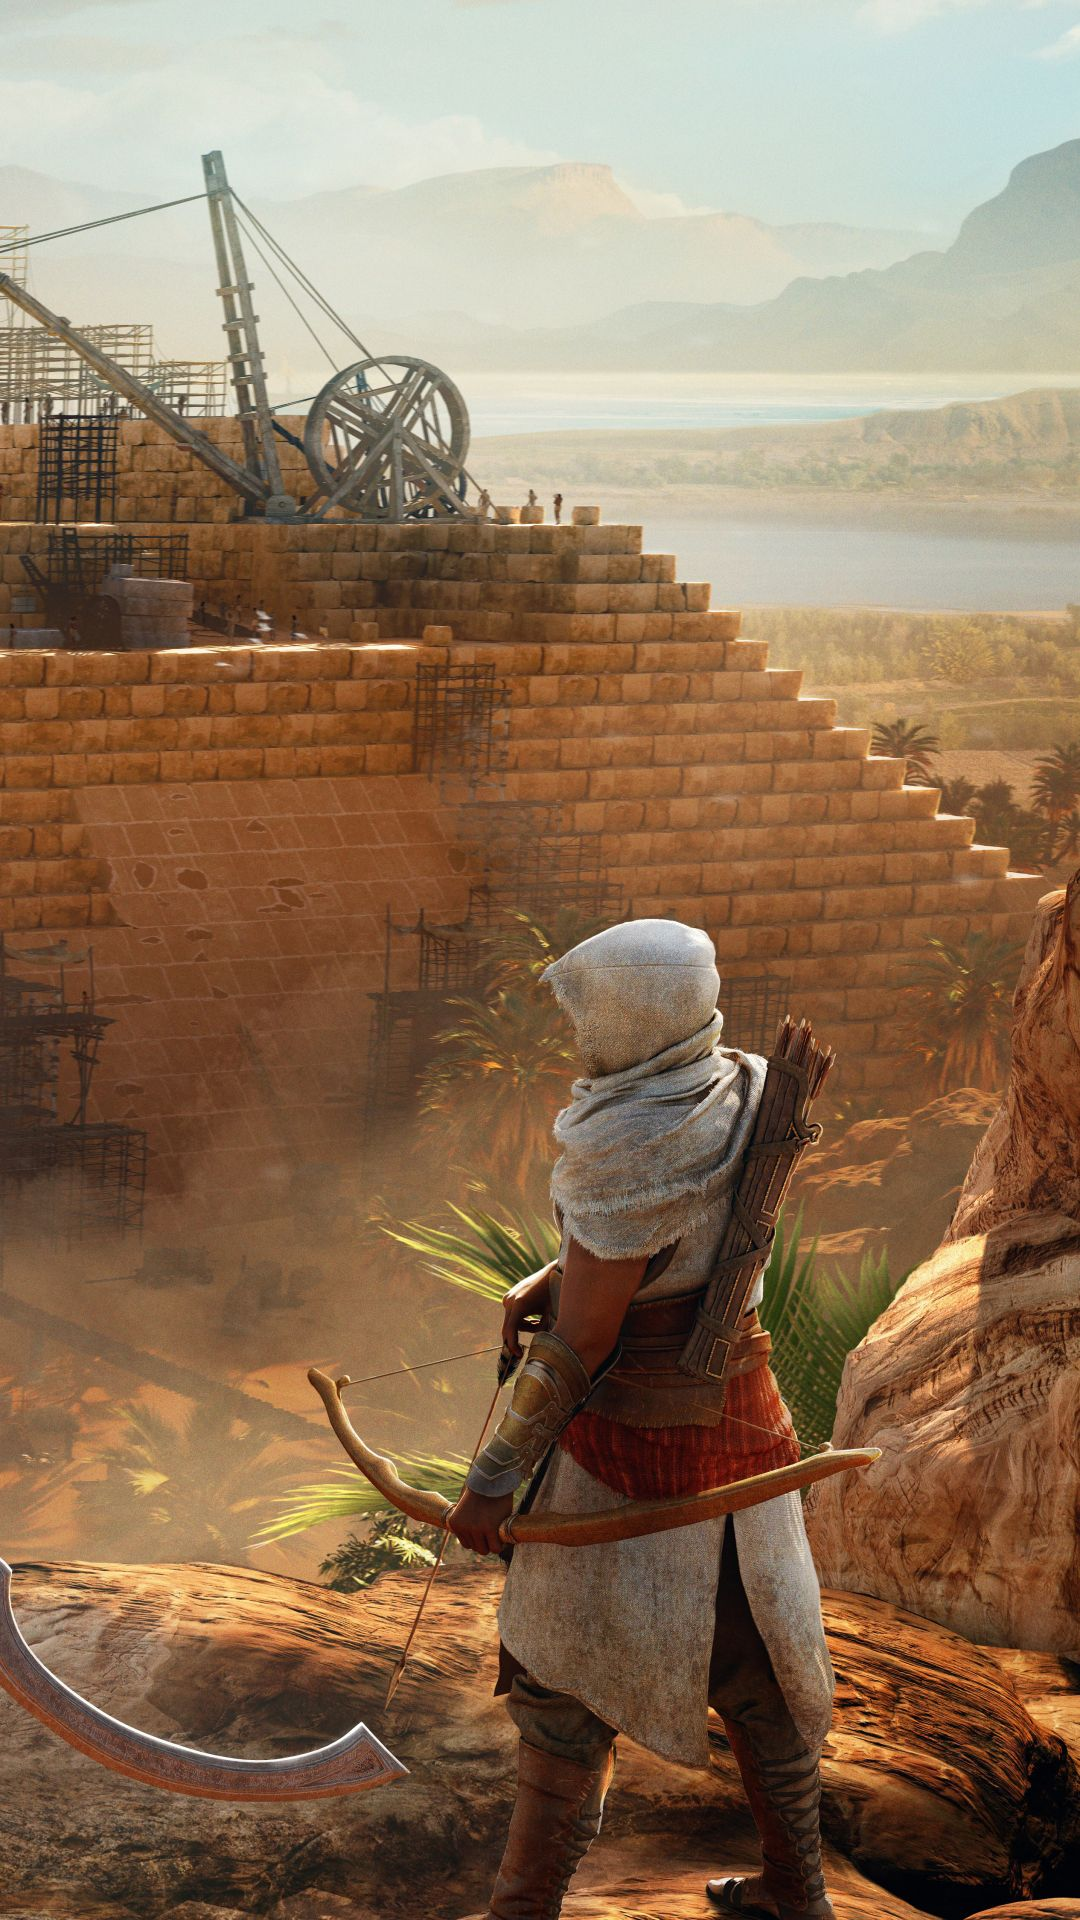 Hd Wallpaper 1 Assassin Creed 3 Pinterest Assassins Creed 3